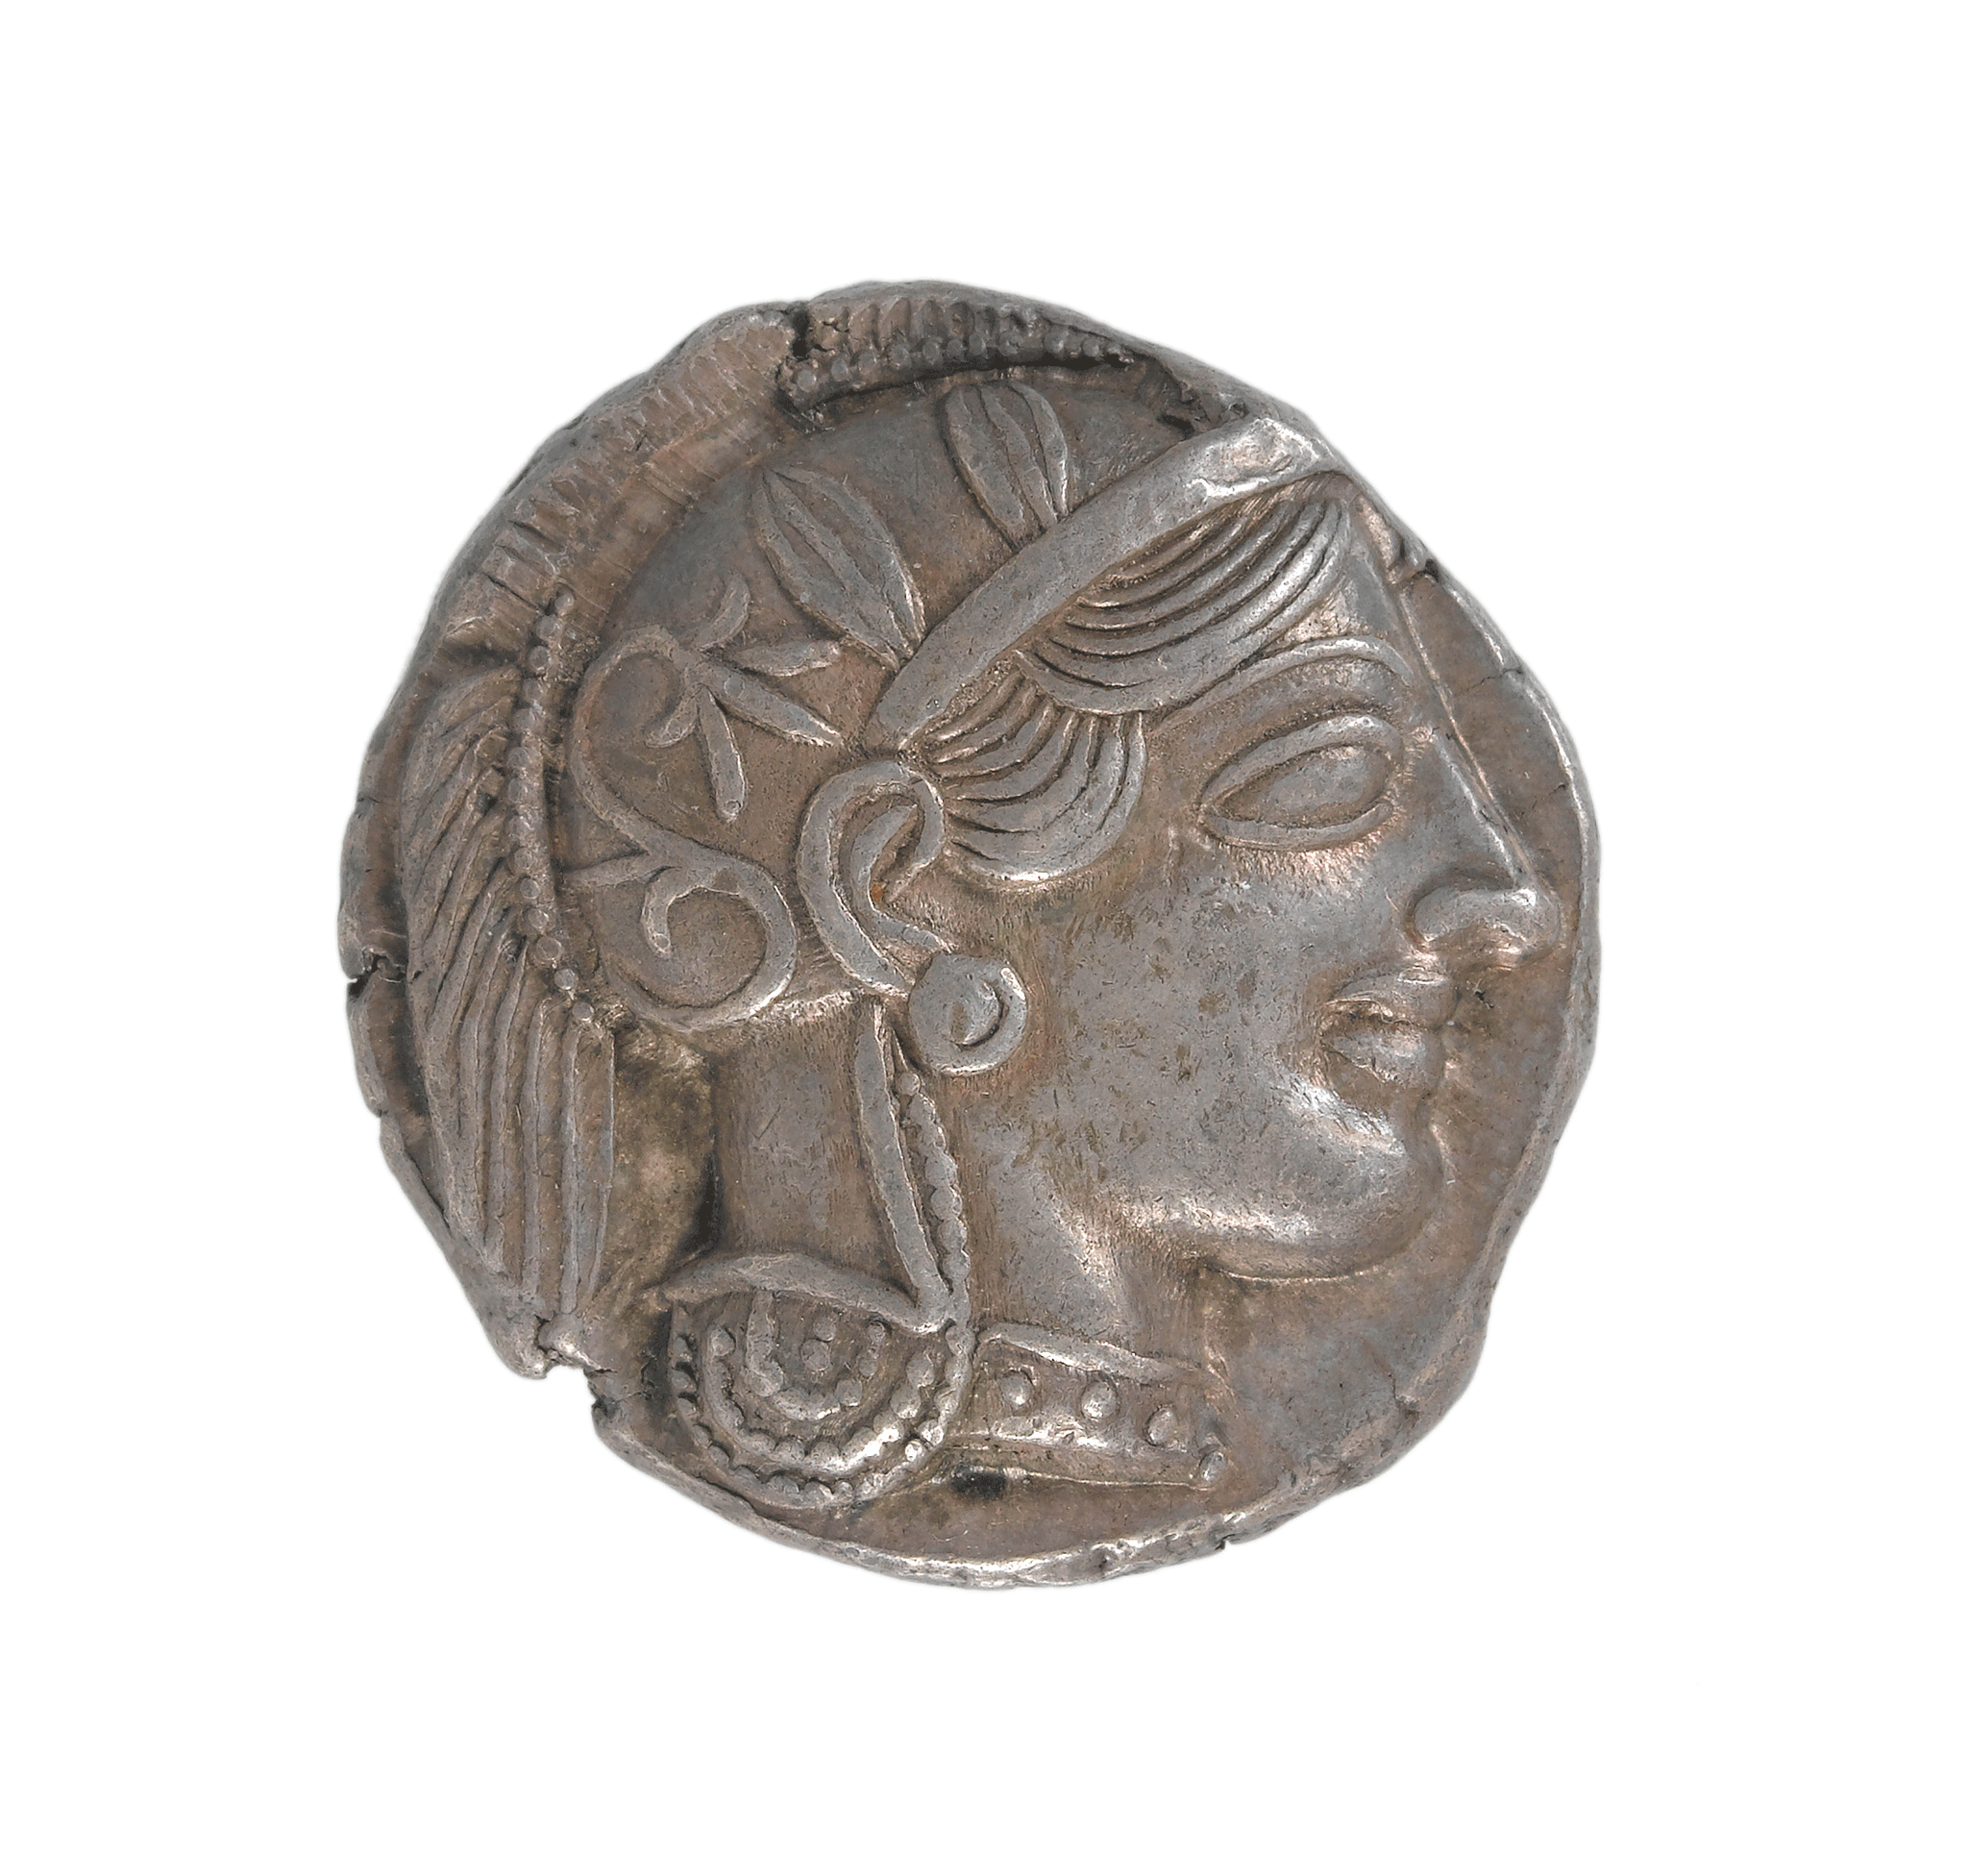 A drachma showing Athena